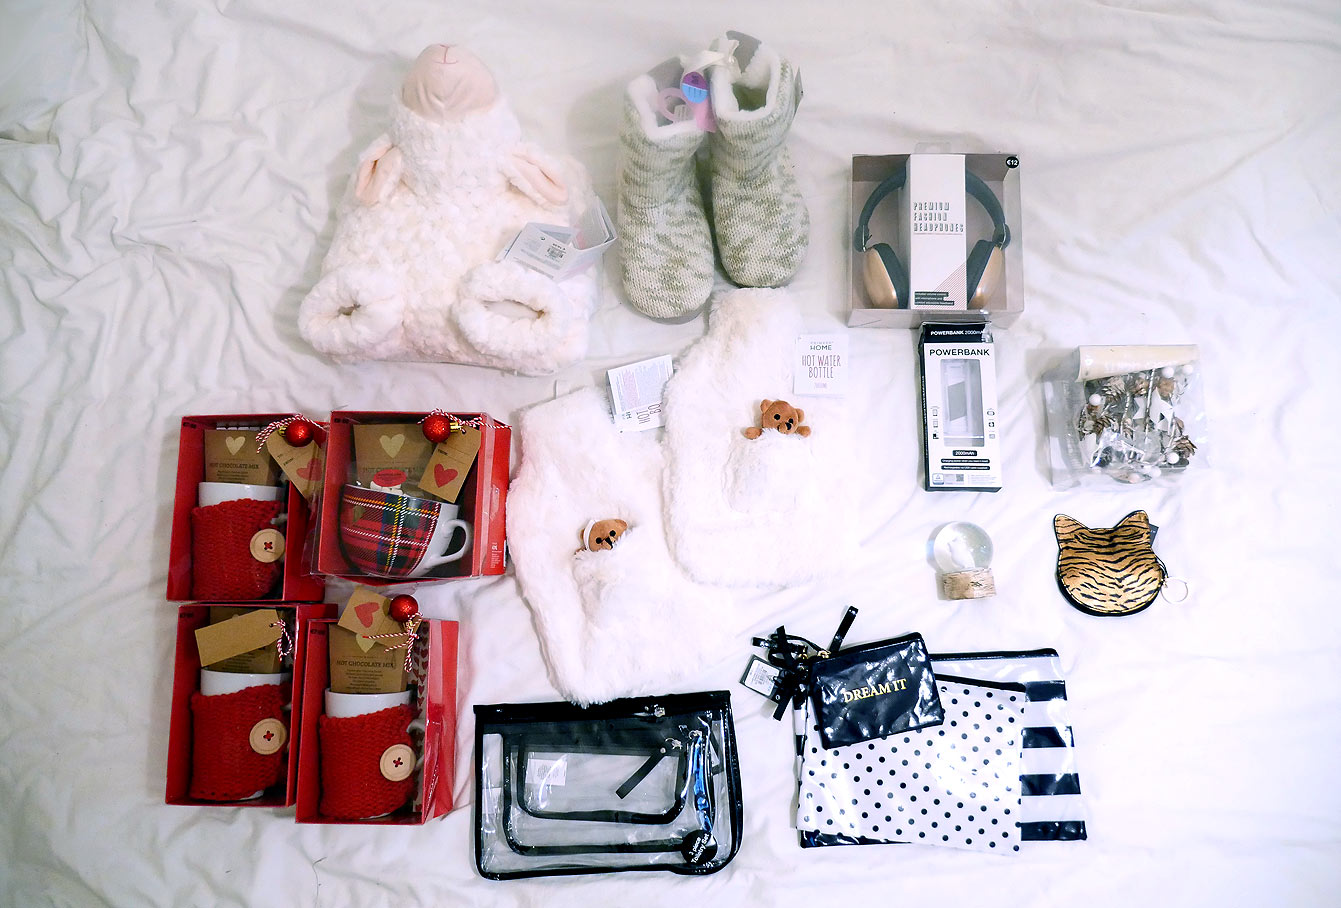 primark-shopping-100-euros